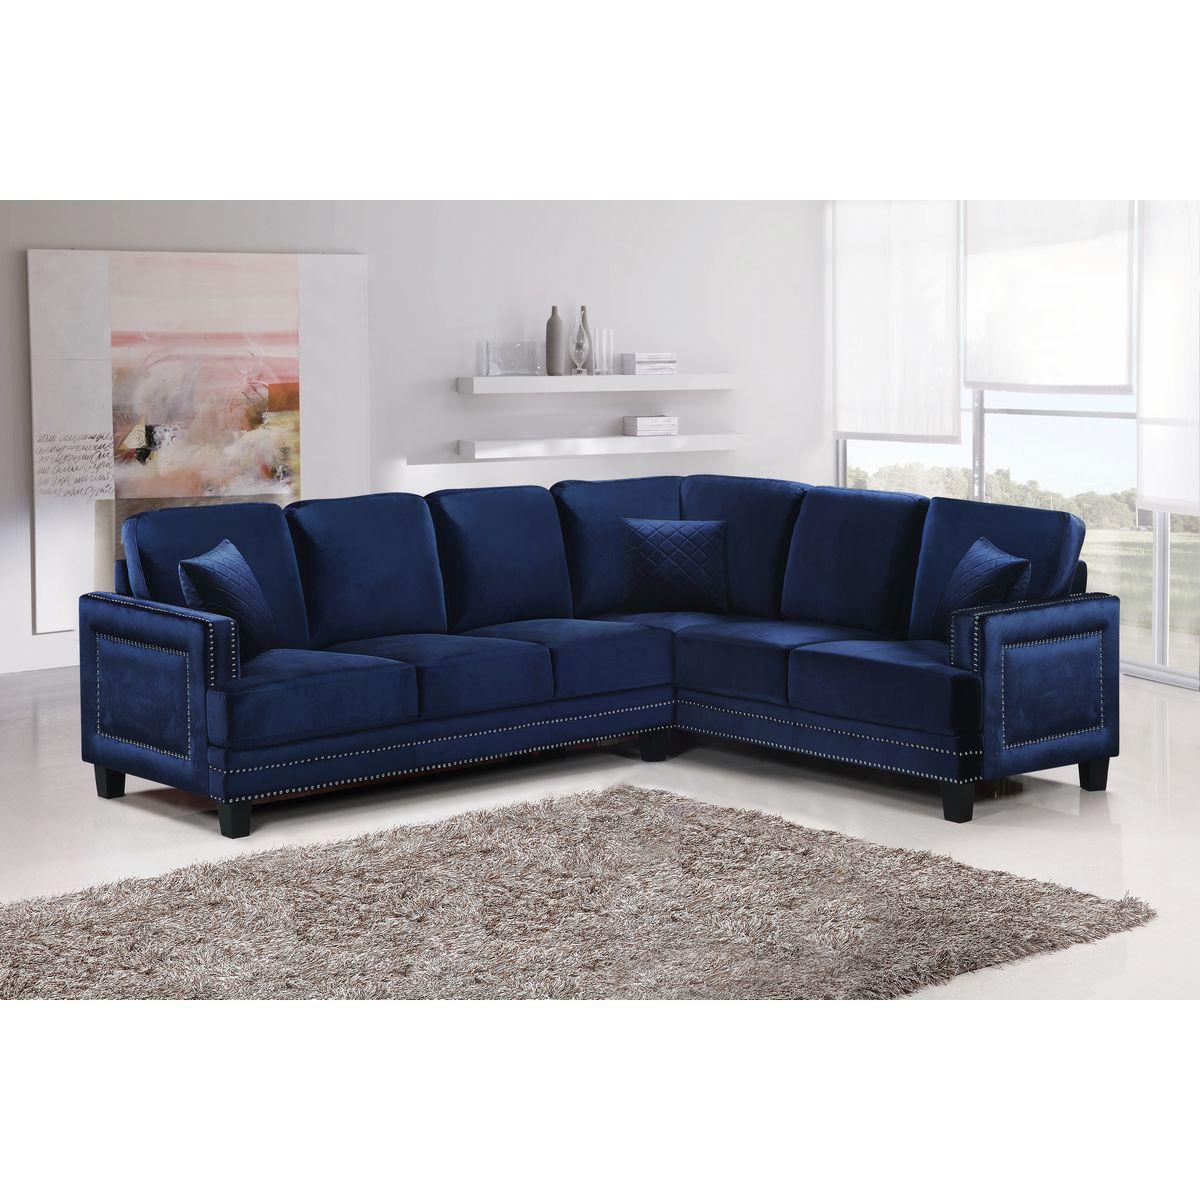 Meridian Furniture 655Navy Sectional Ferrara Sectional Sofa in